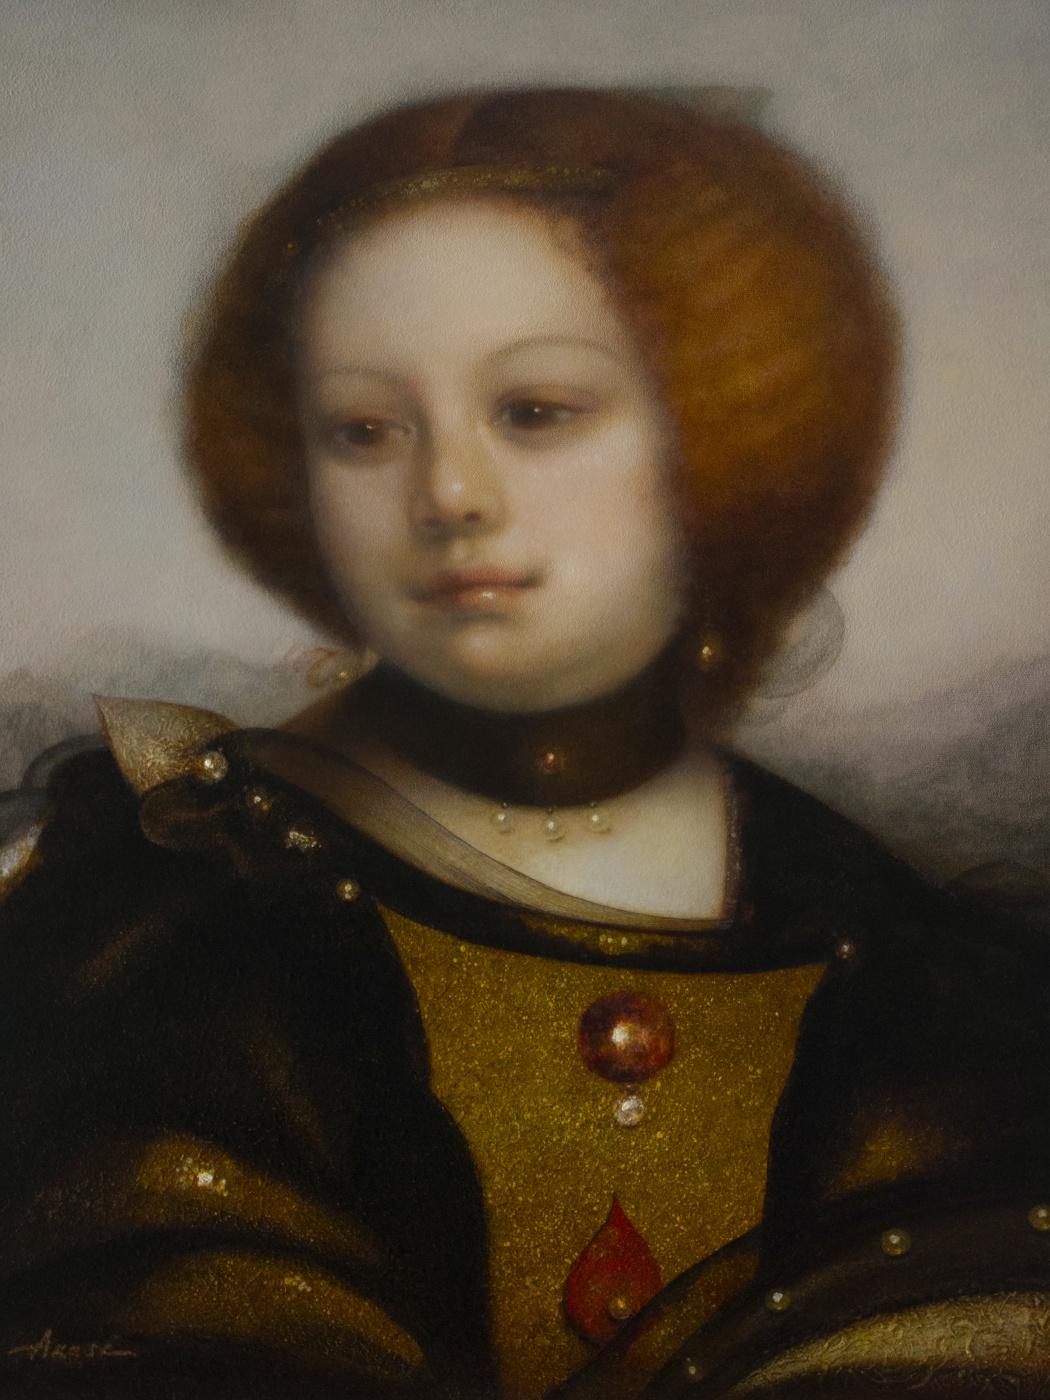 Ольга Акаси. La Bella Simonetta